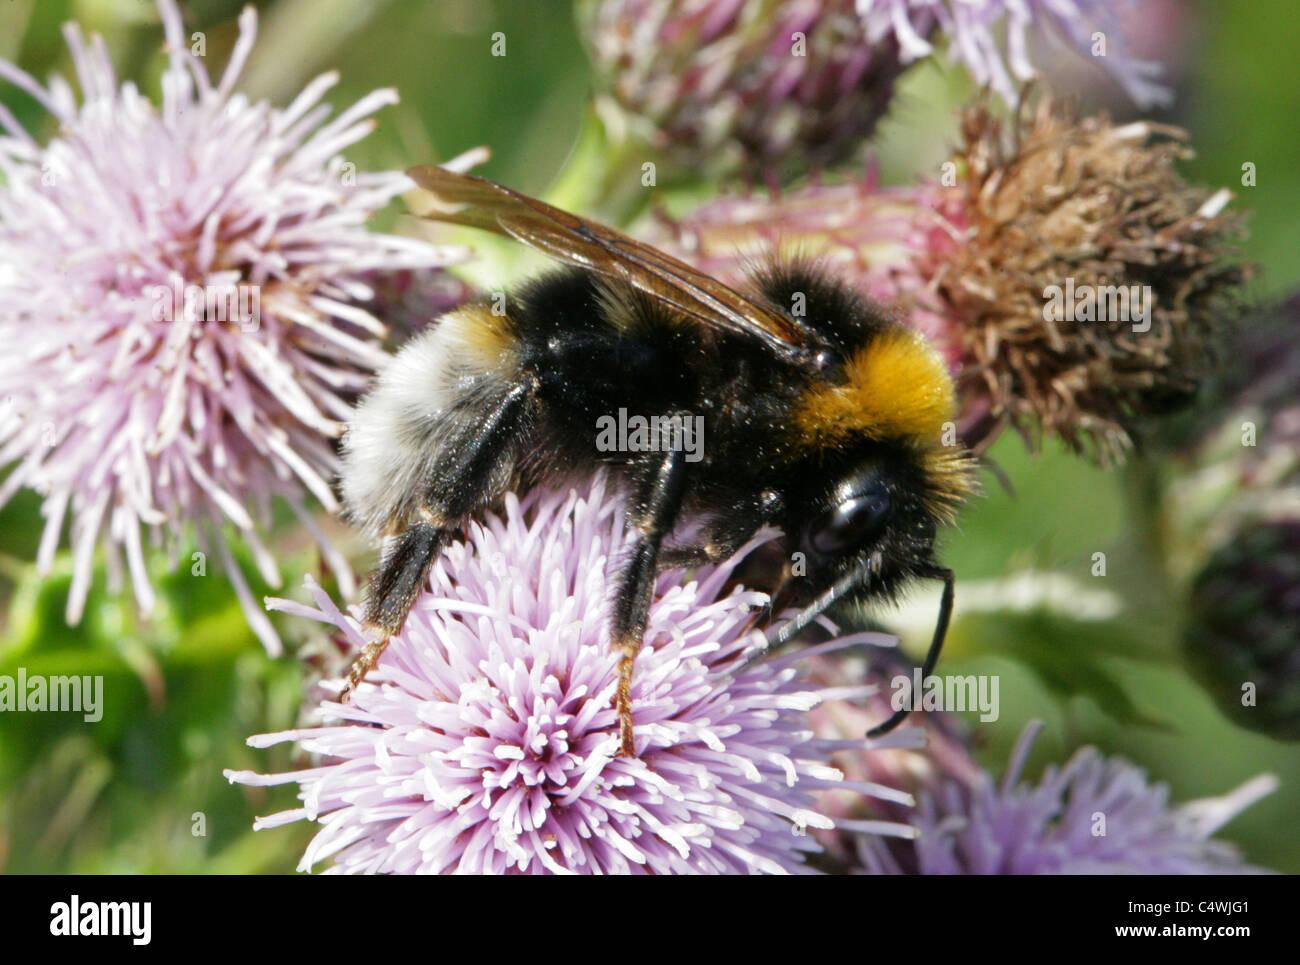 Gypsy Cuckoo Bumblebee, Bombus bohemicus, Apinae, Apidae, Apoidea, Apocrita, Hymenoptera. Syn. Psithyrus bohemicus. - Stock Image